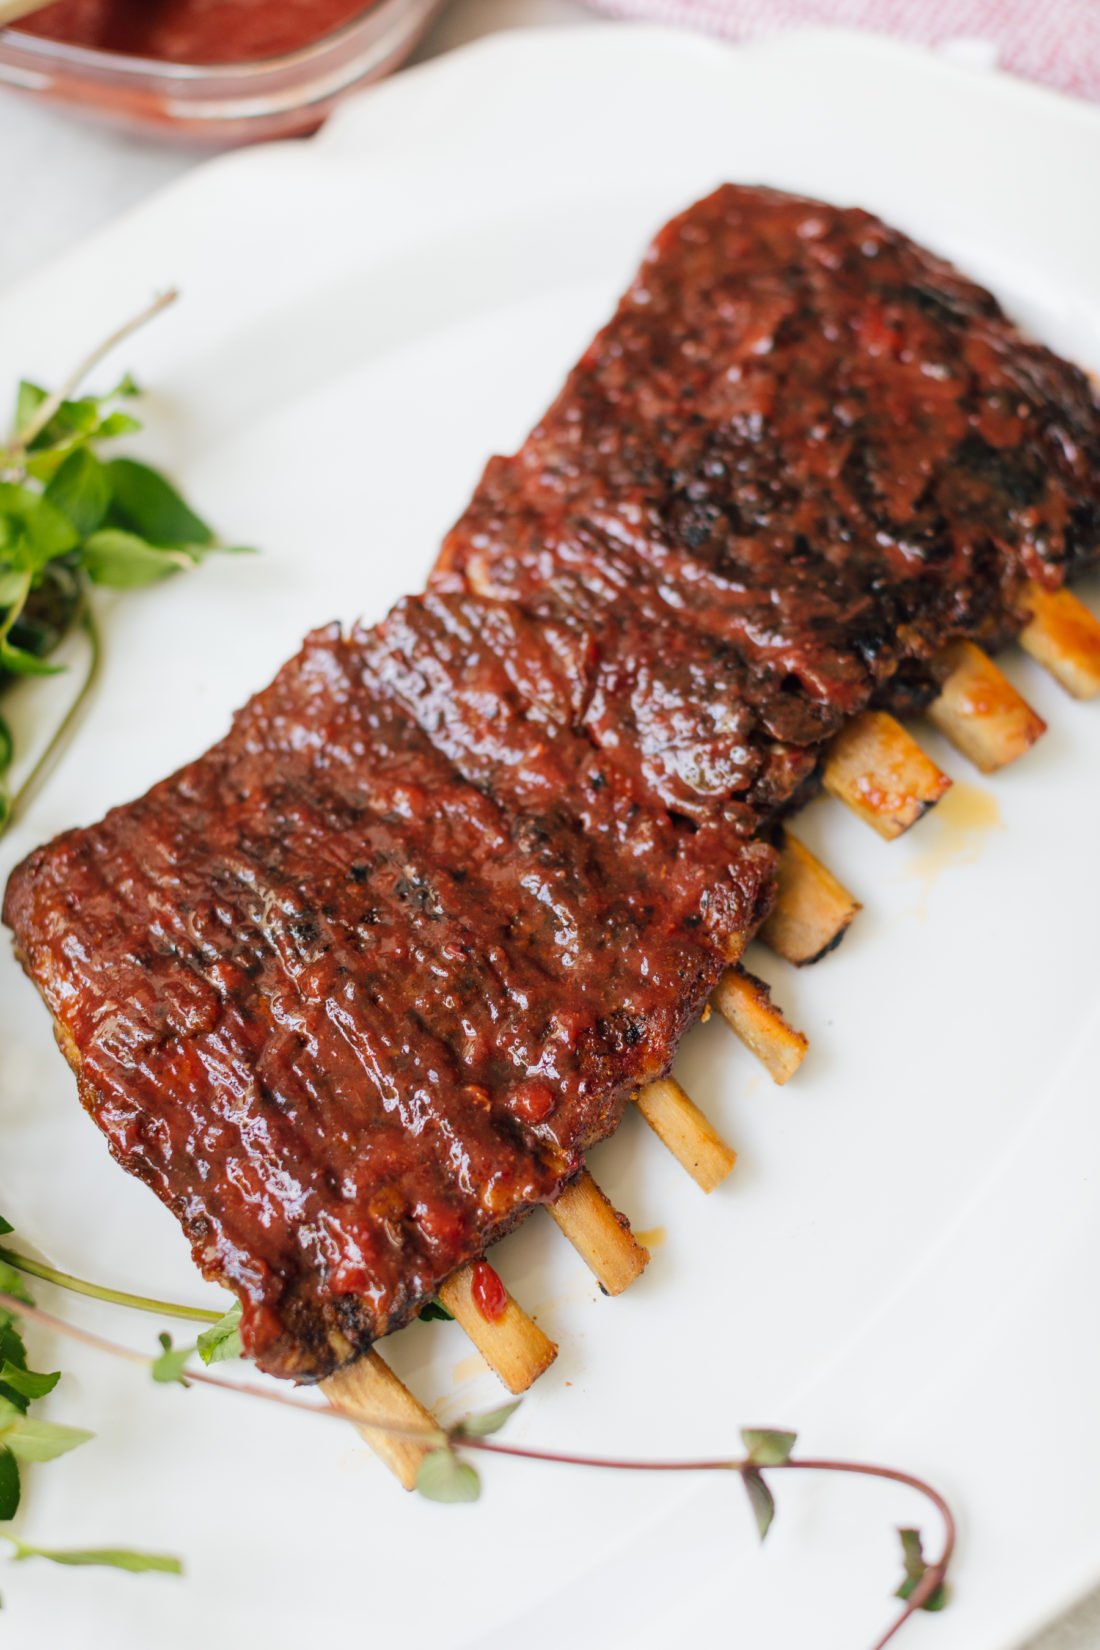 Eva Amurri Martino's Dry Rubbed Ribs With Stone Fruit BBQ Sauce